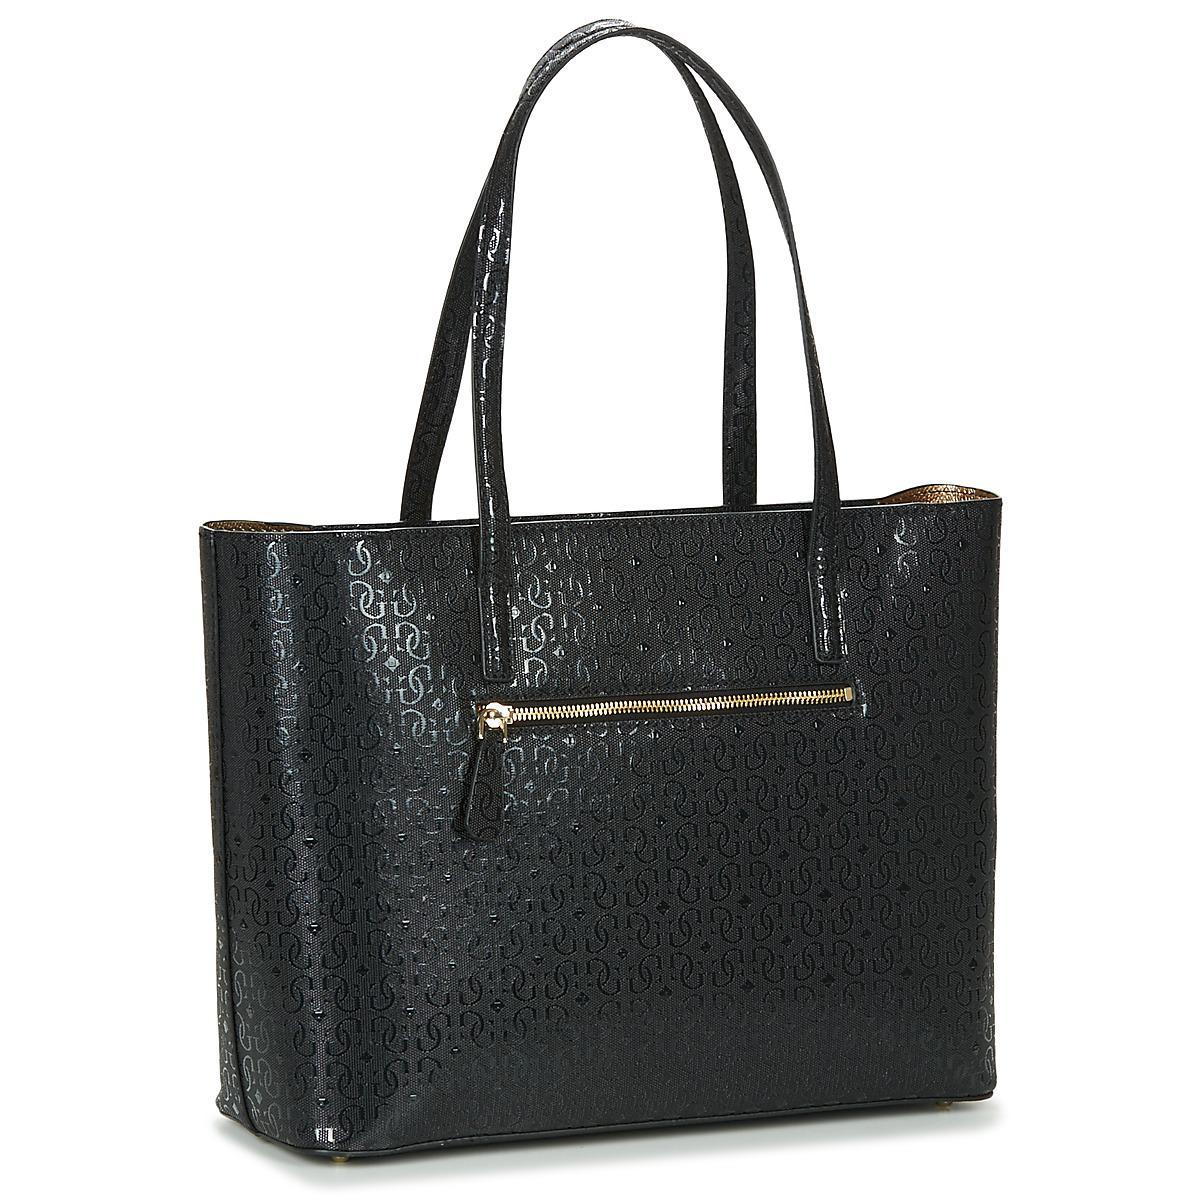 Guess Jayne Tote Women's Shopper Bag In Black